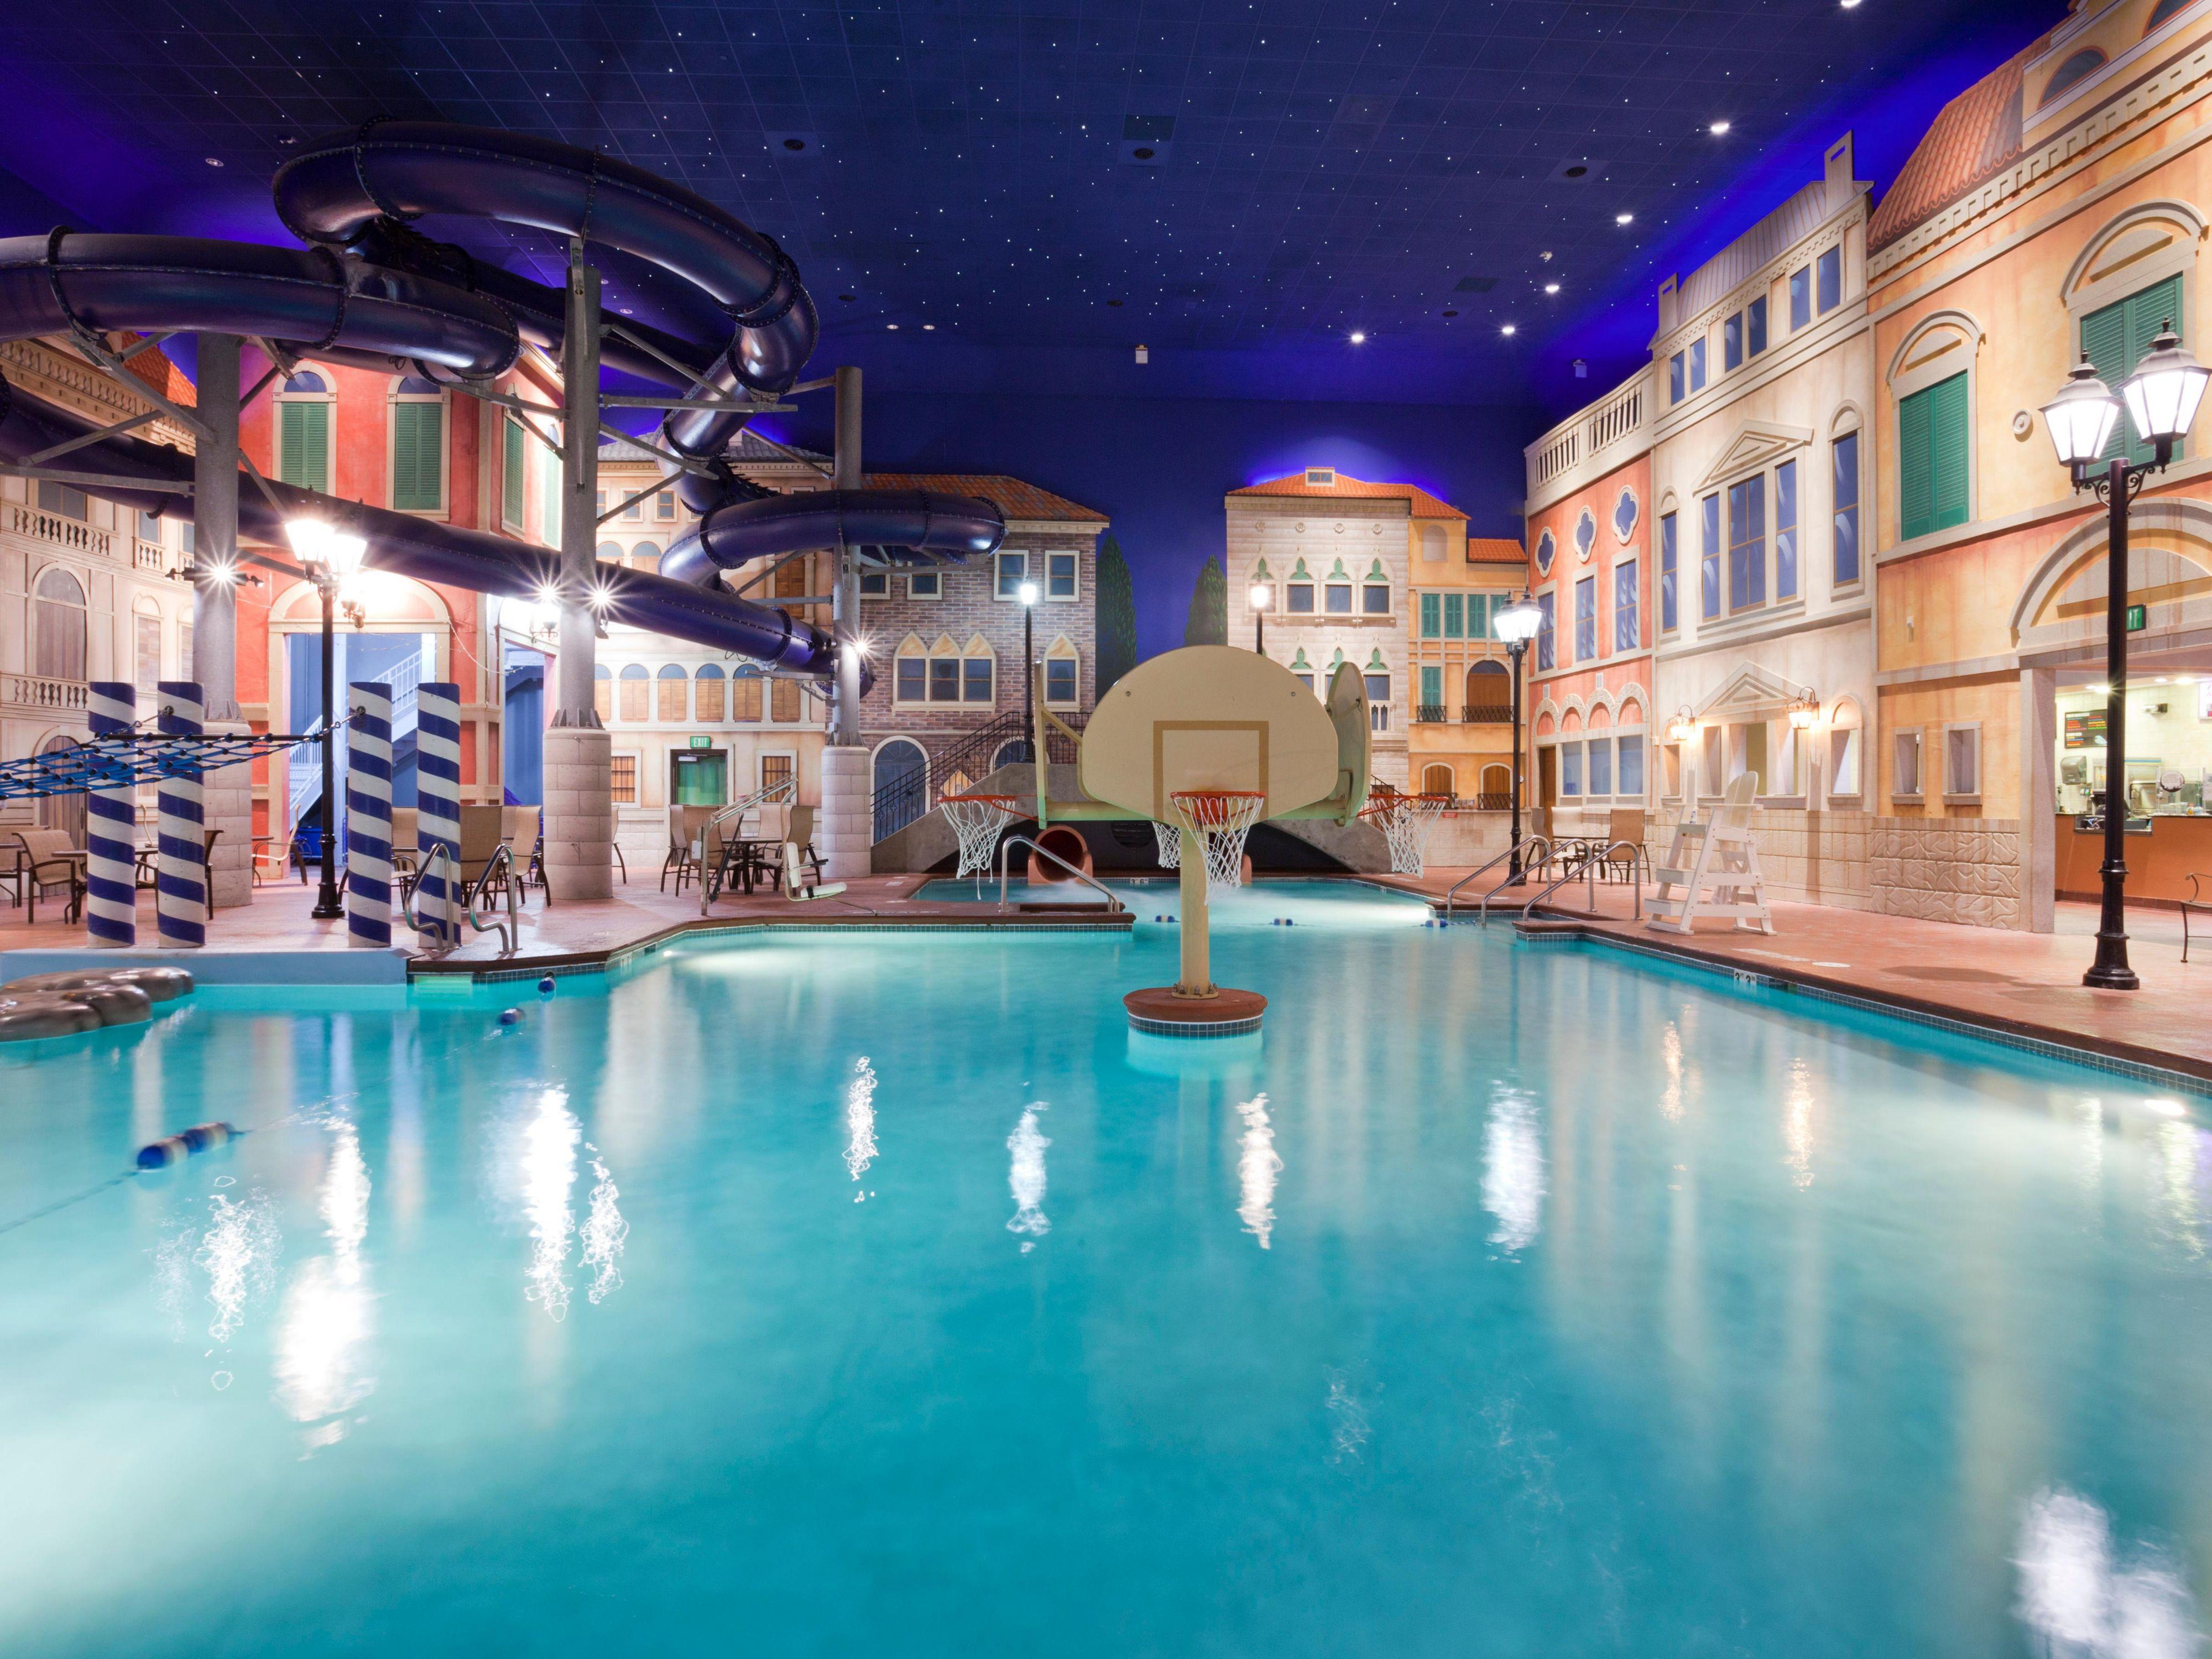 Enjoy Year Round Fun At 10 Minnesota Indoor Water Parks